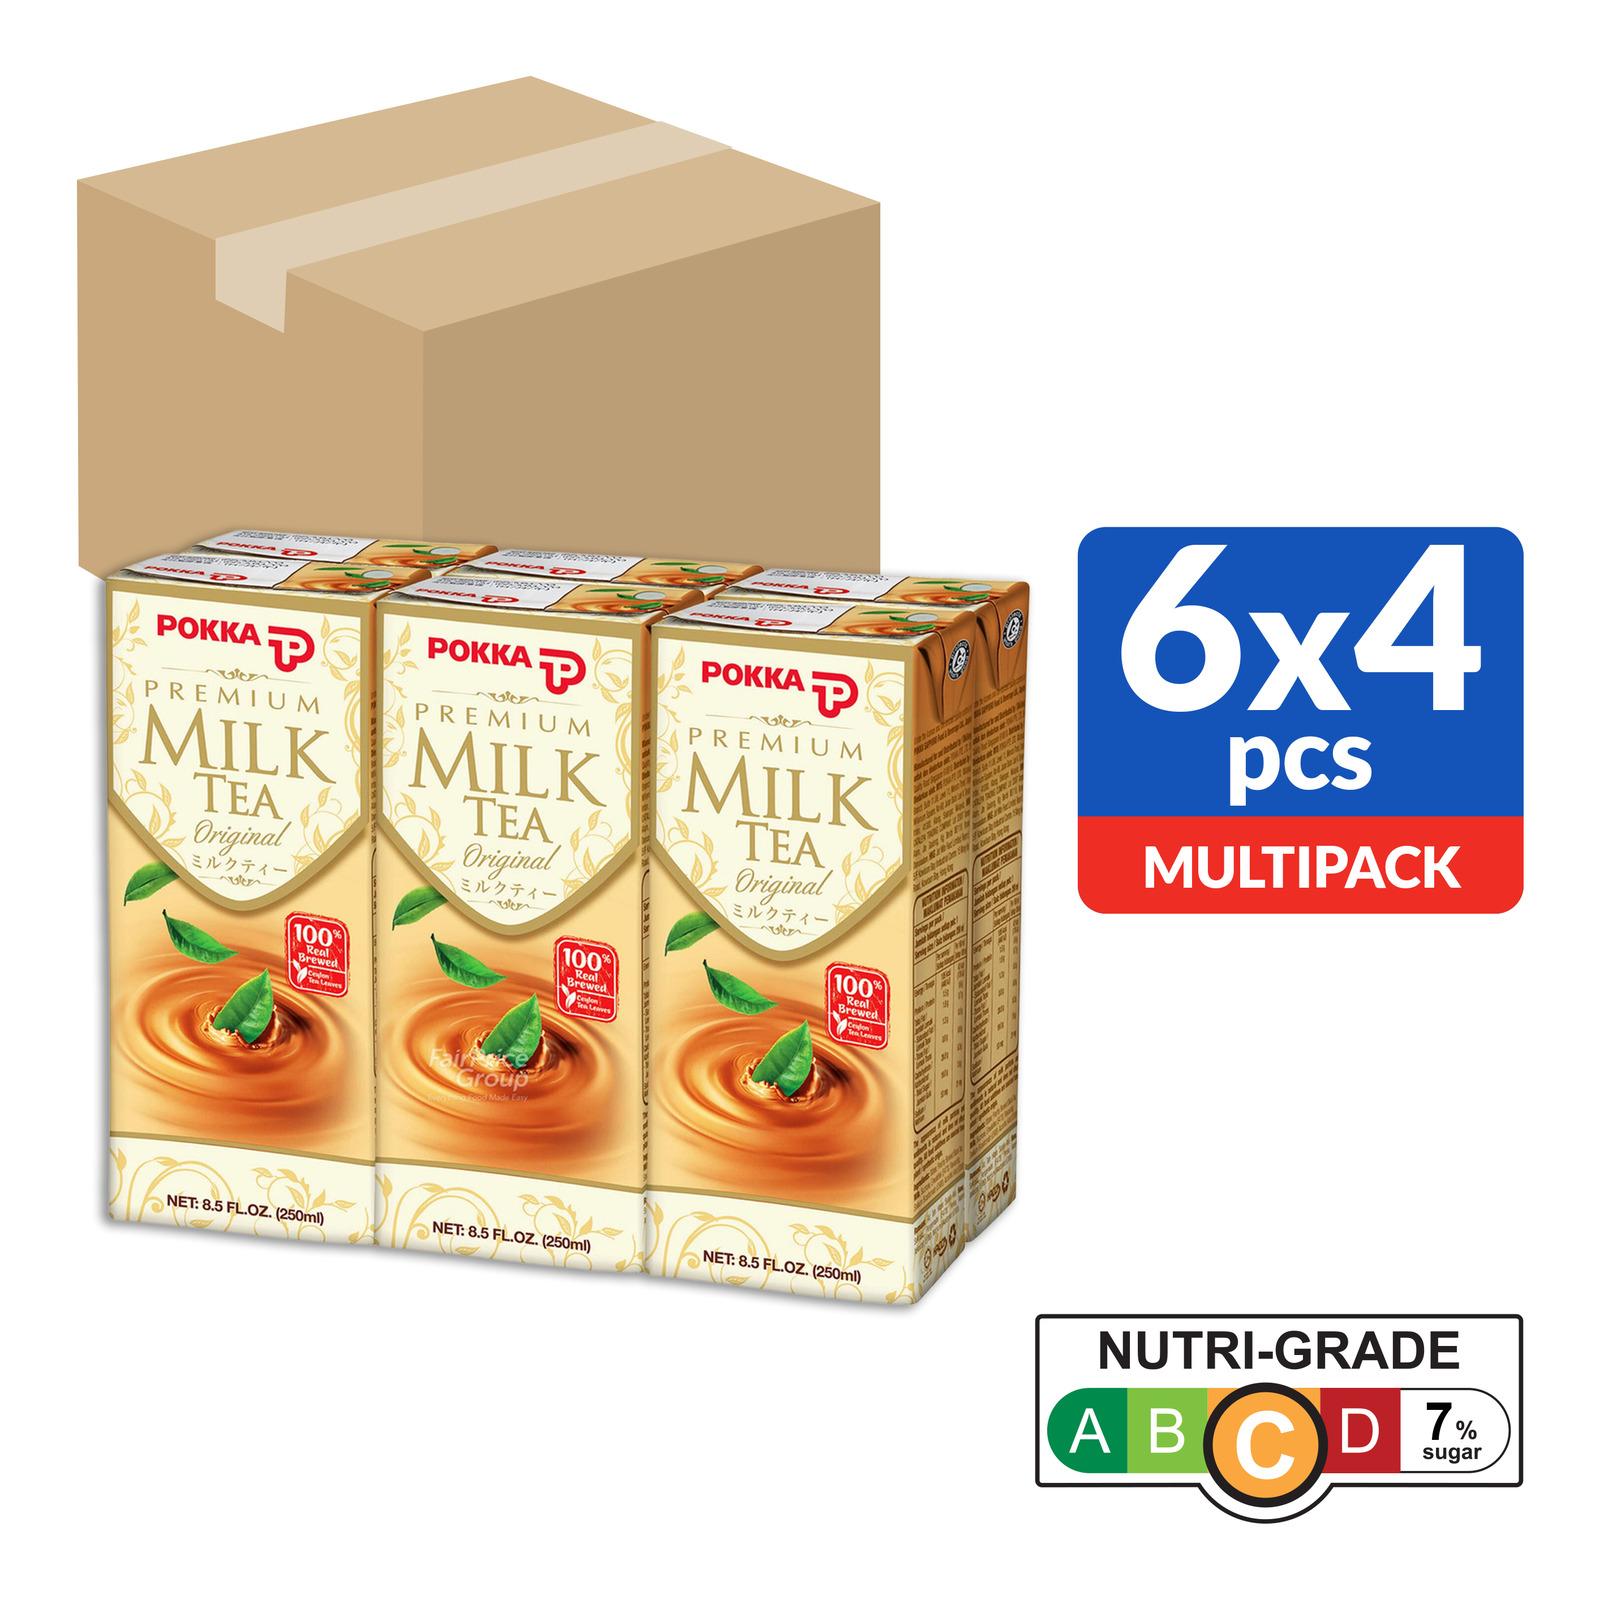 Pokka Premium Packet Drink - Milk Tea (Original)